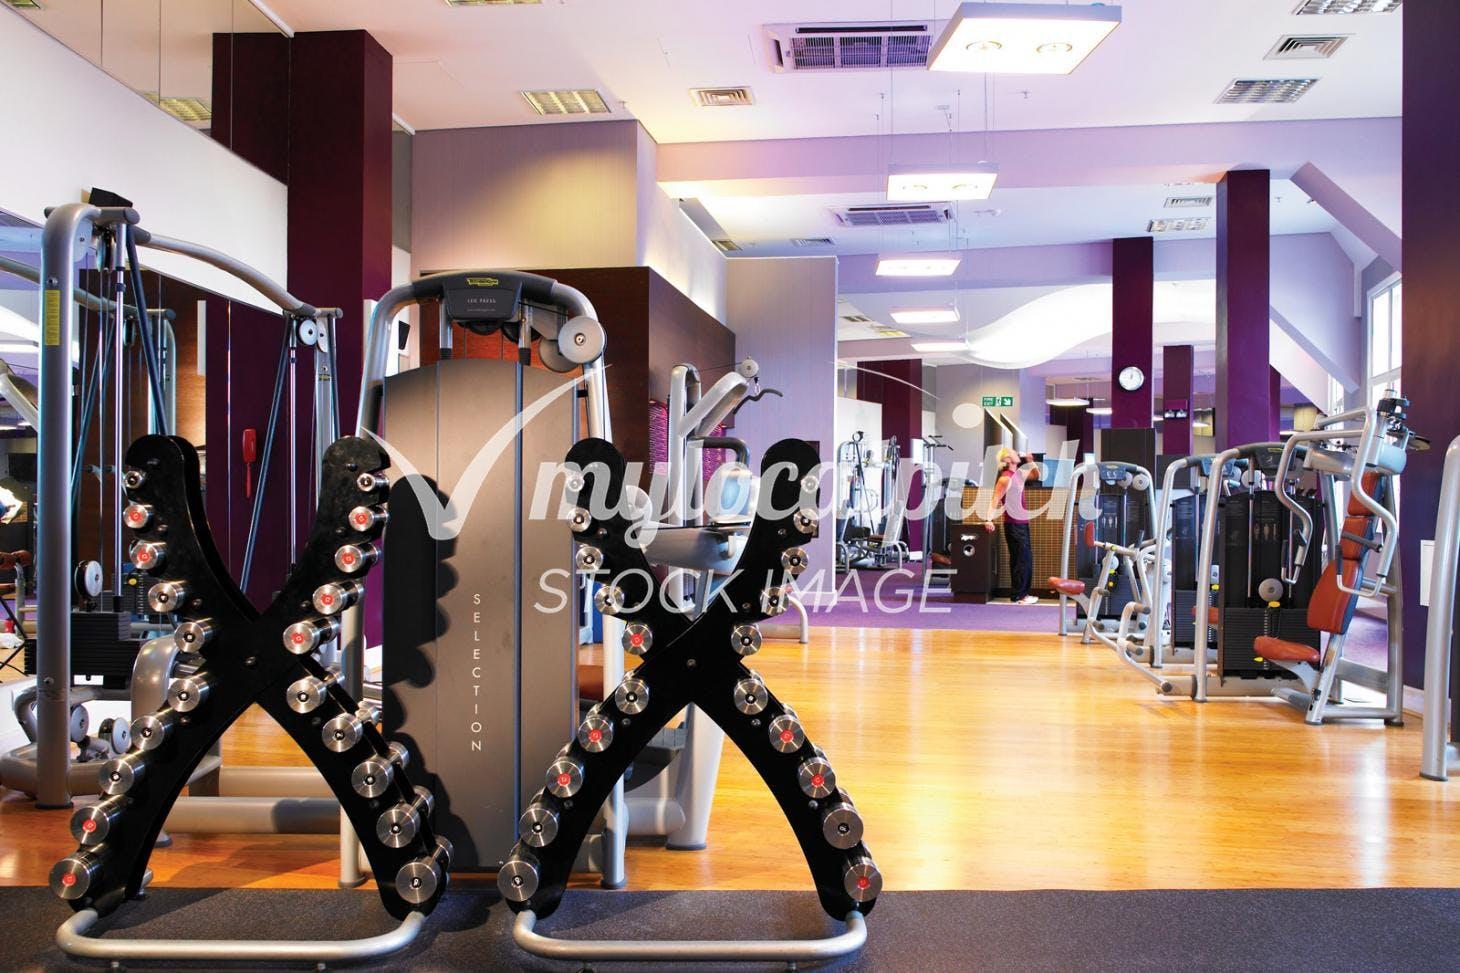 UCS Active Gym gym